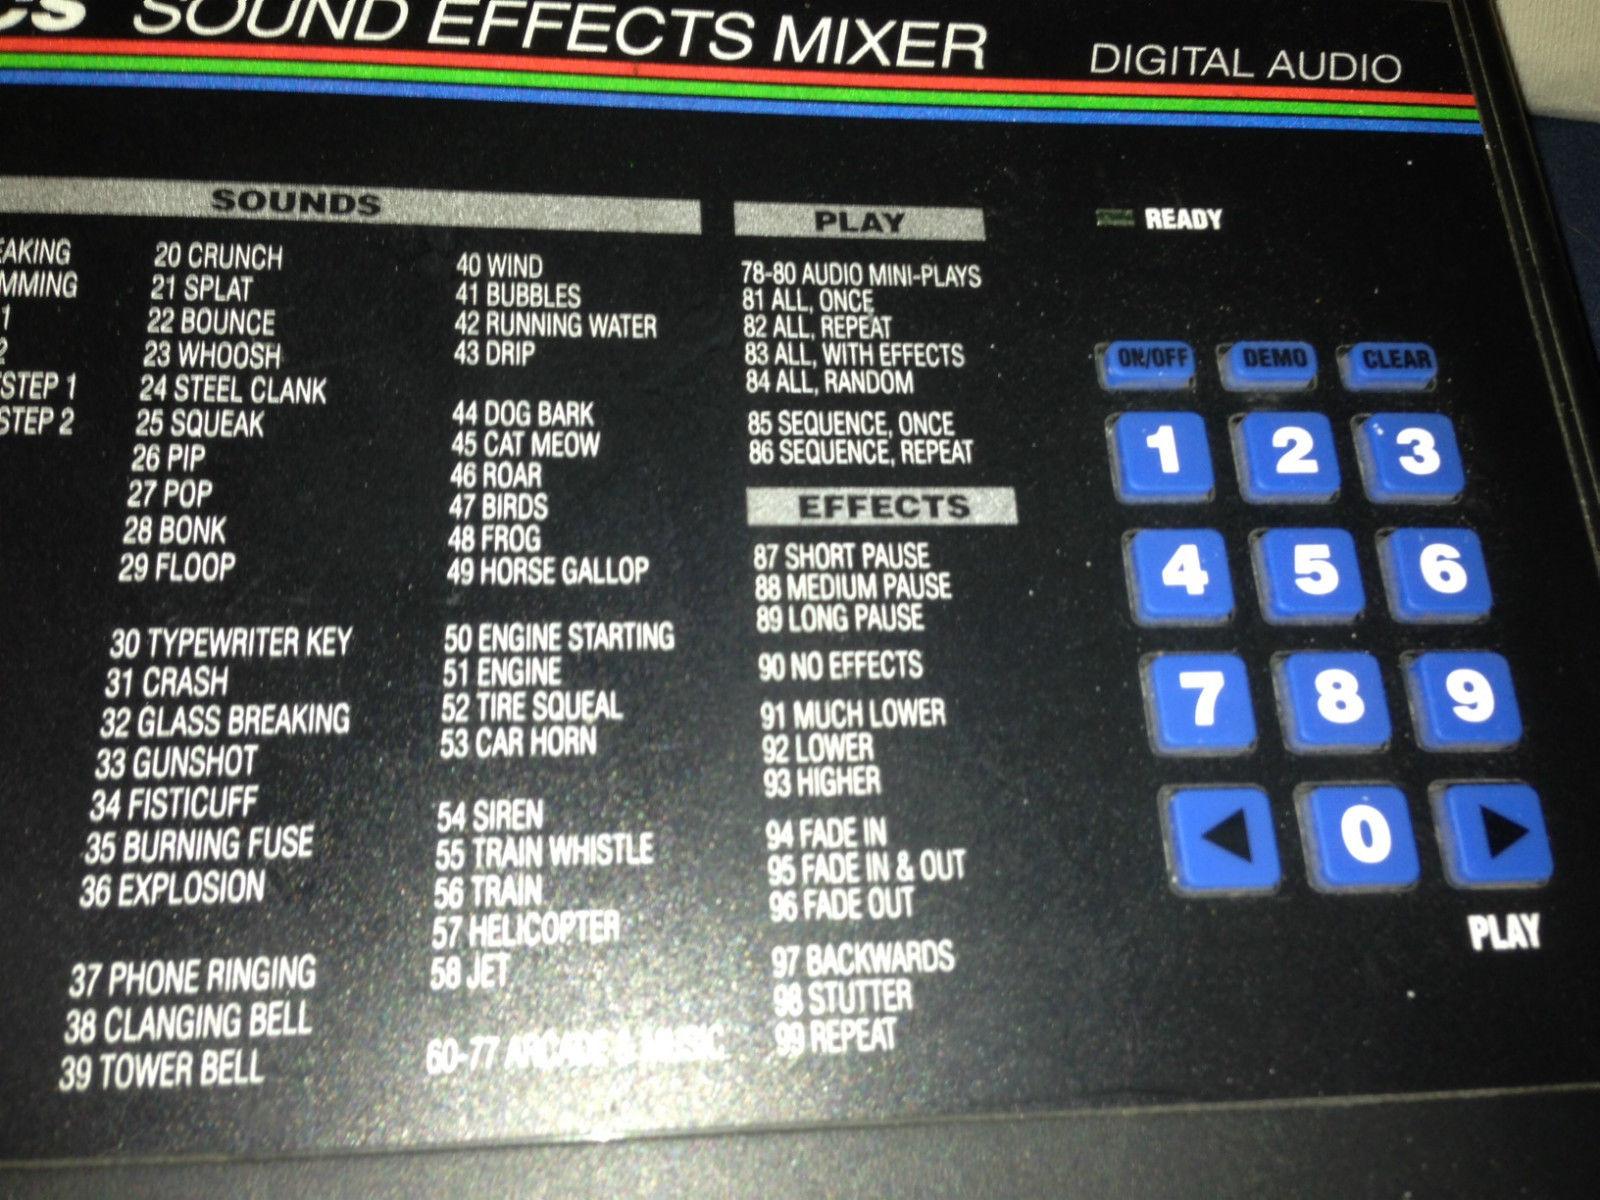 MATRIXSYNTH: Videonics Sound Effects Mixer